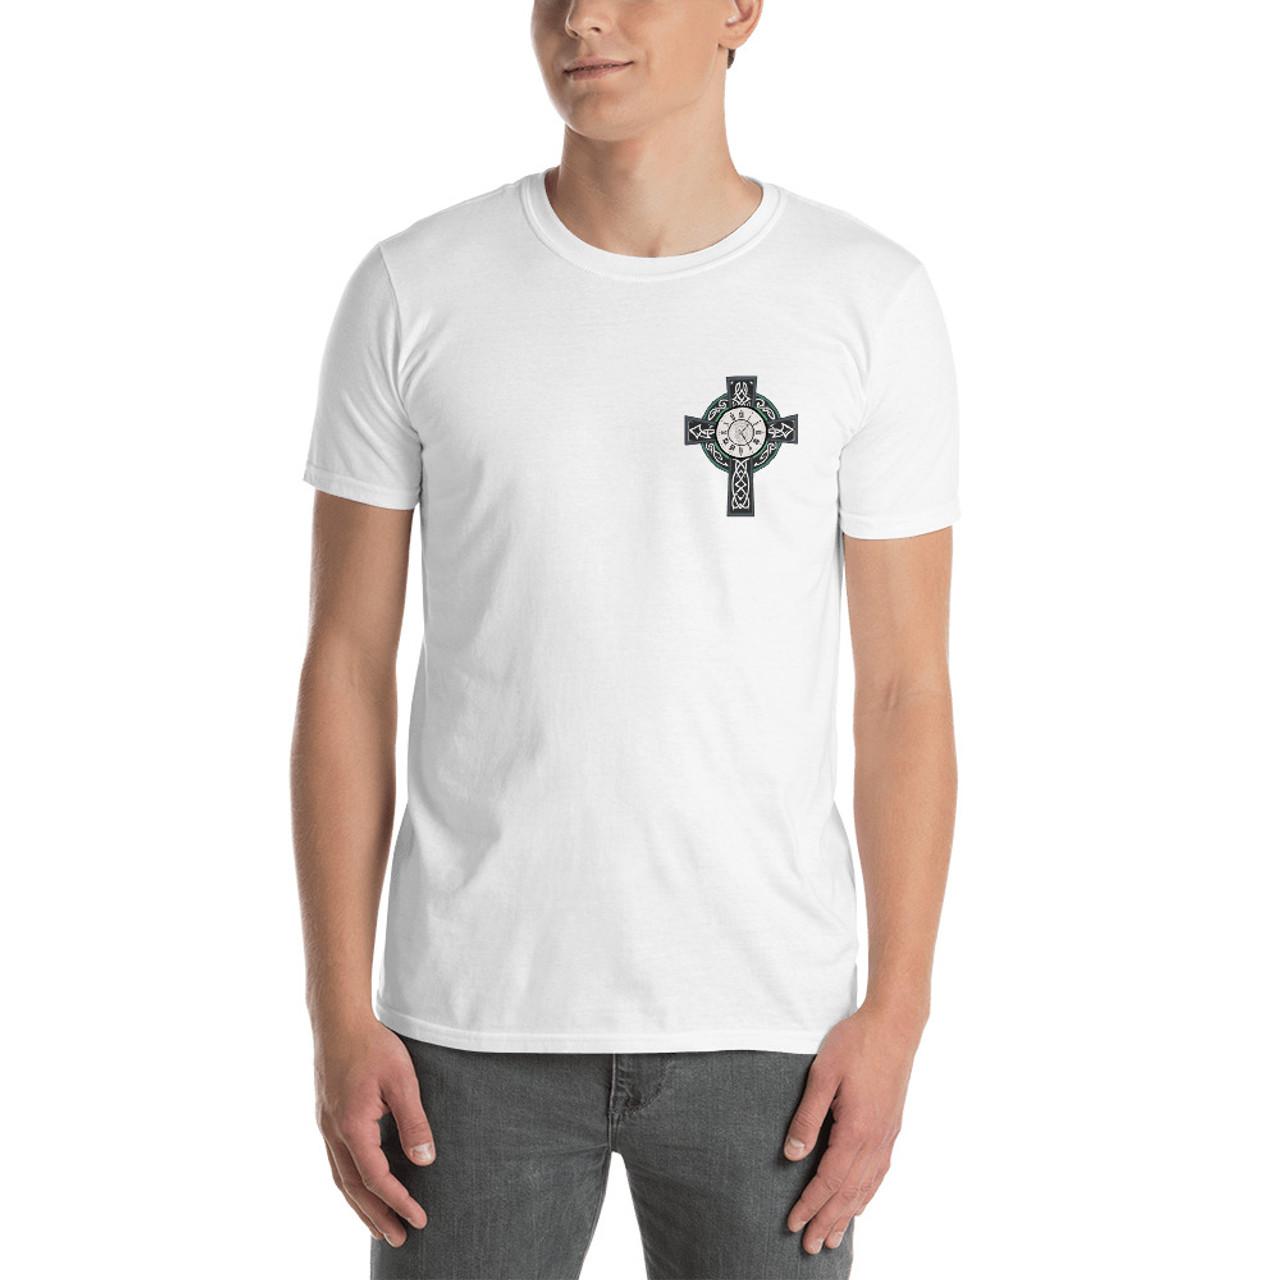 Christopher Laurito Memorial Shirt